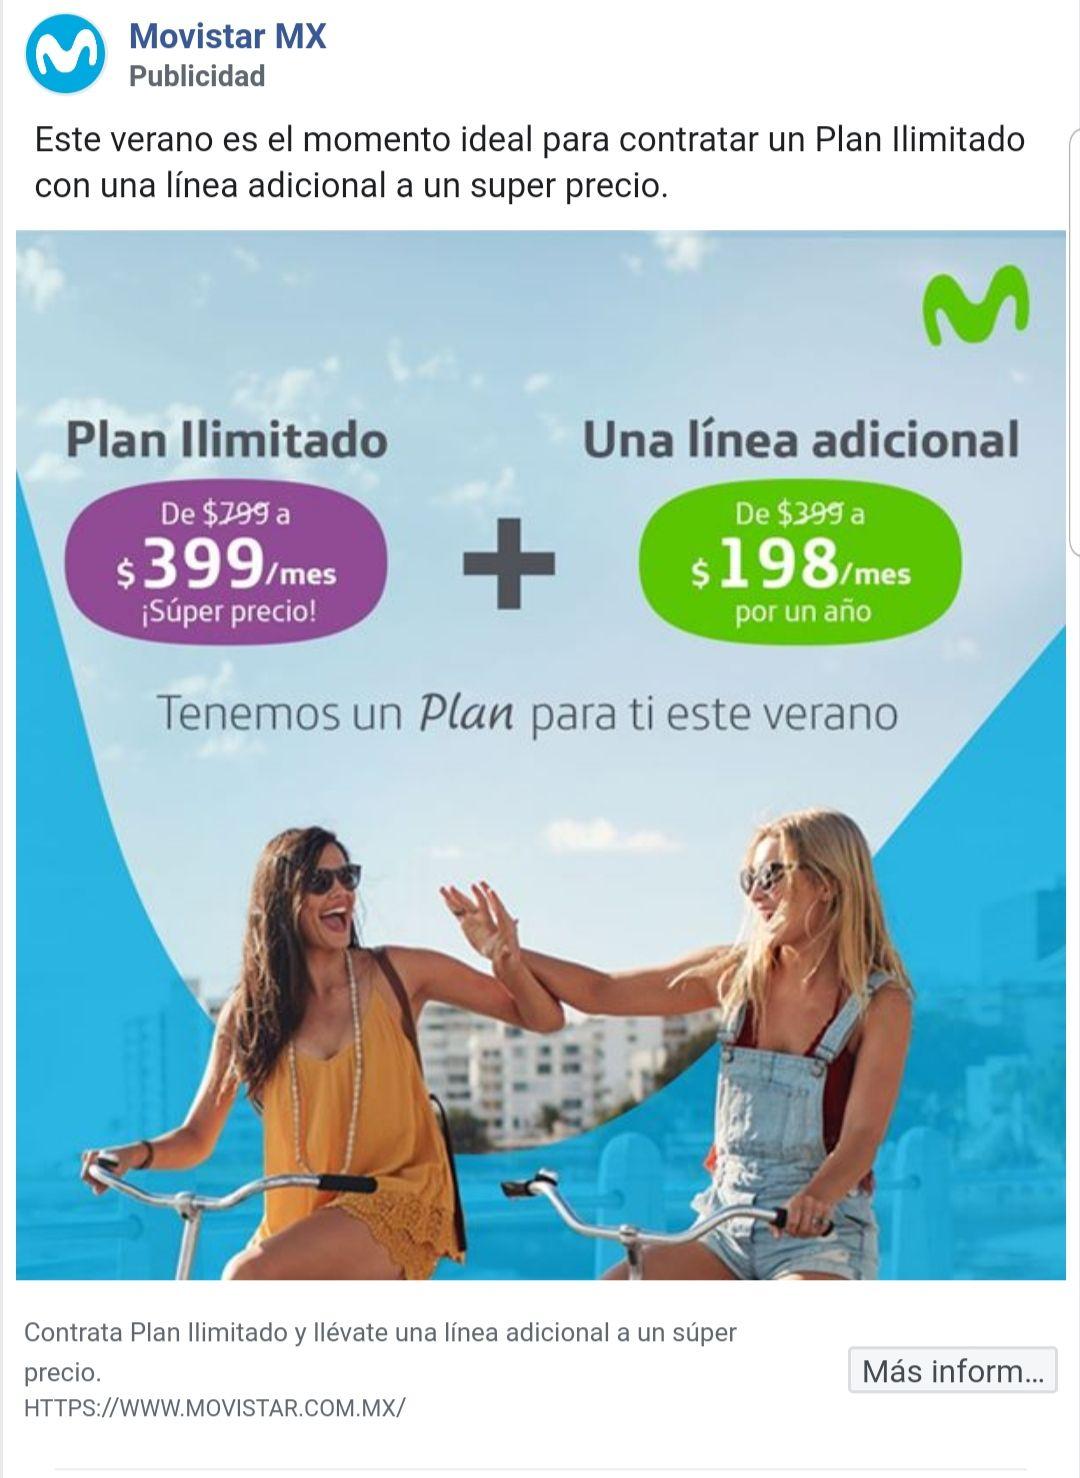 Movistar: Plan ilimitado, linea adicional por $198